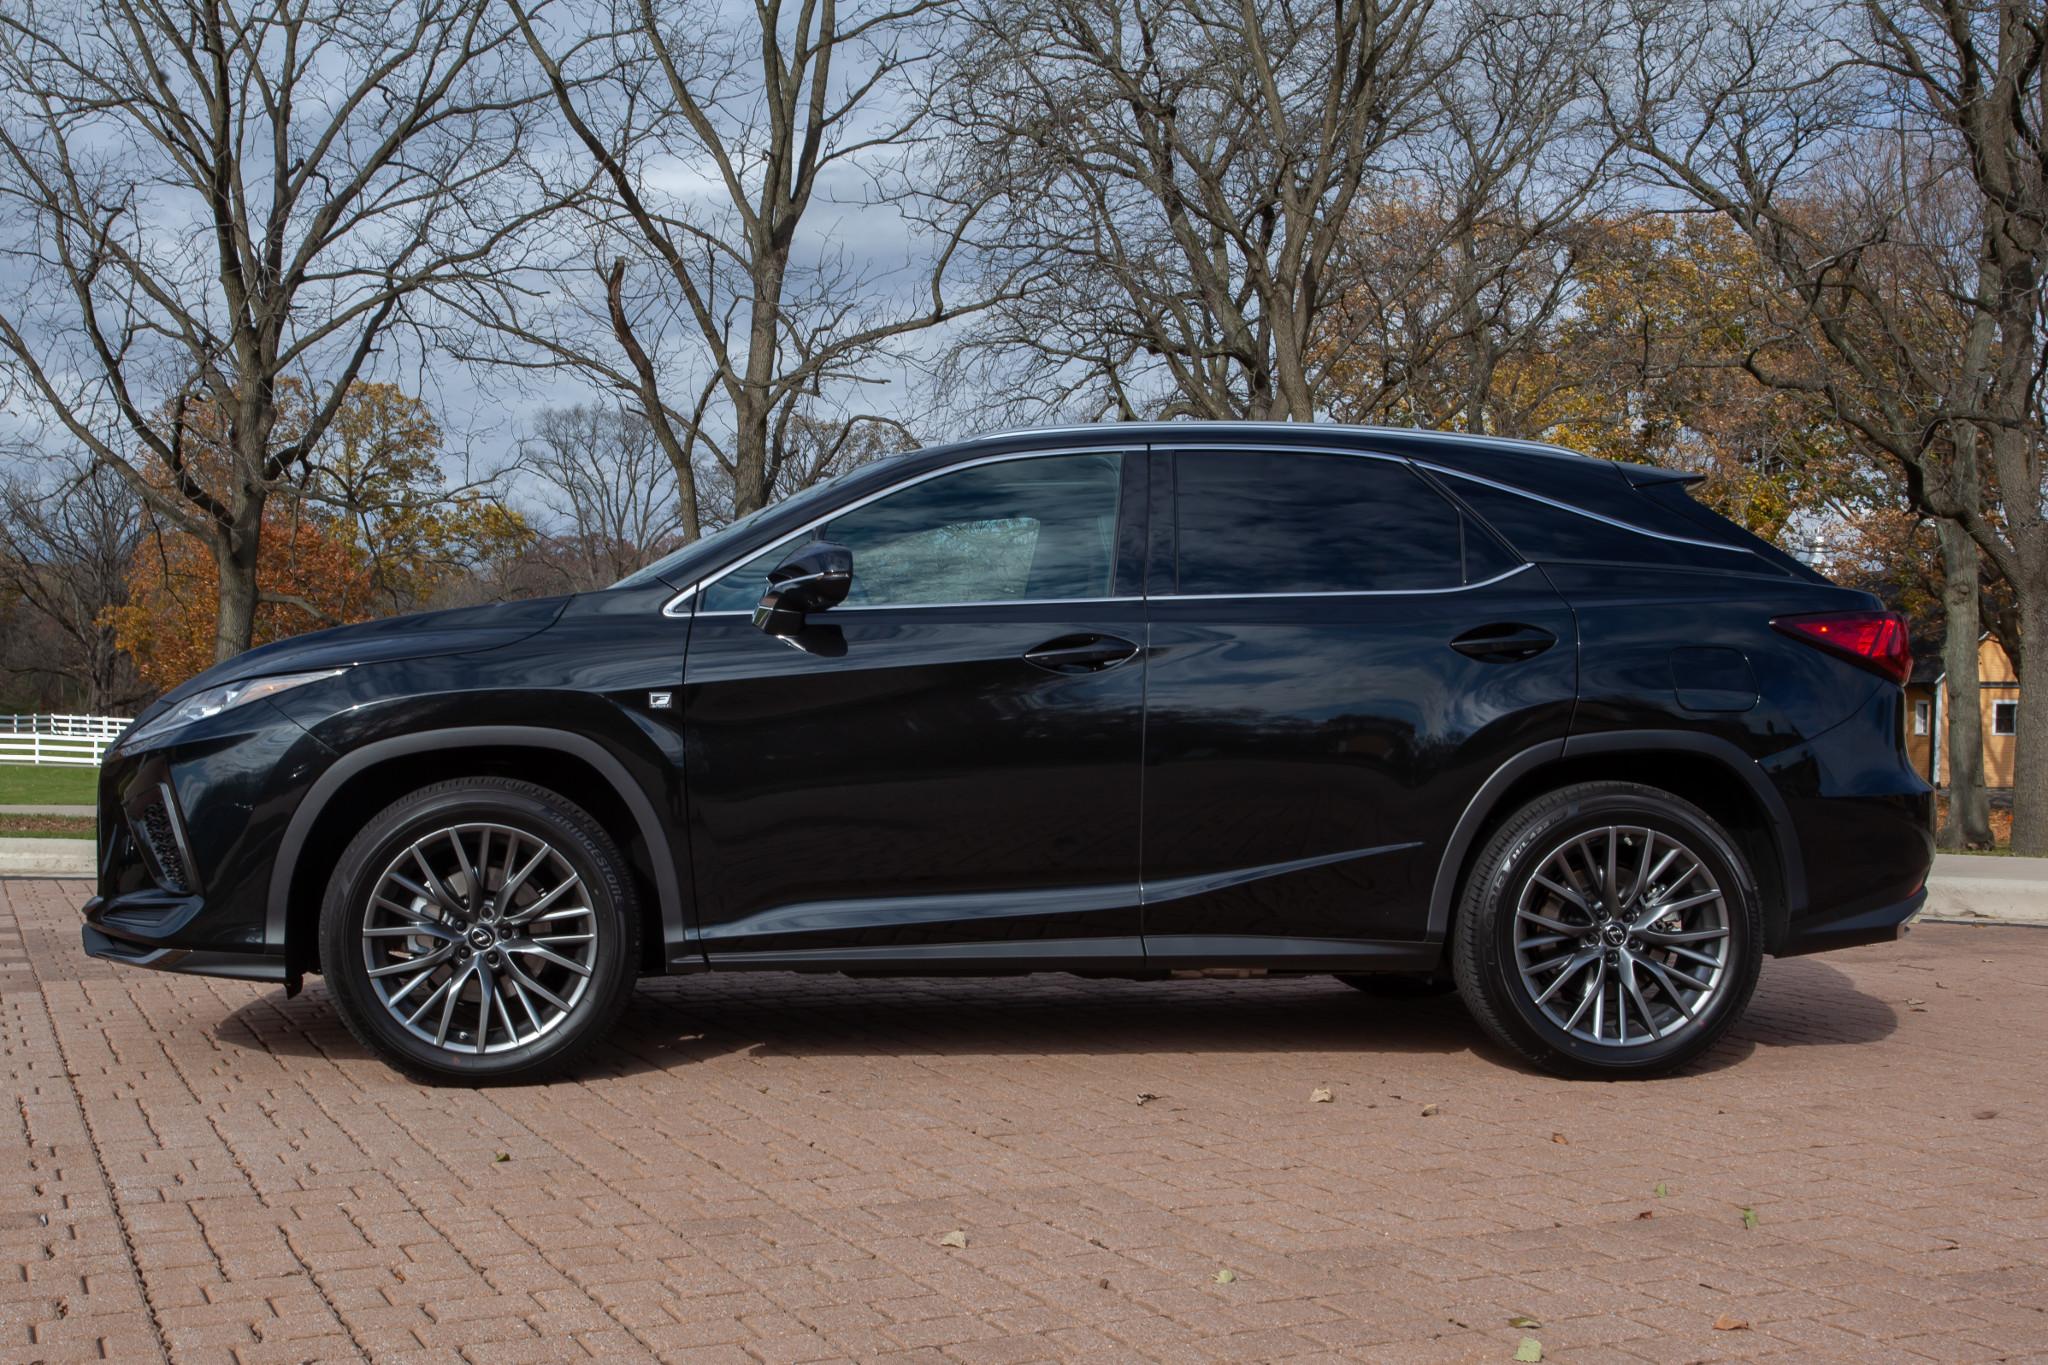 lexus-rx-350-2020--07-black--exterior--profile.jpg